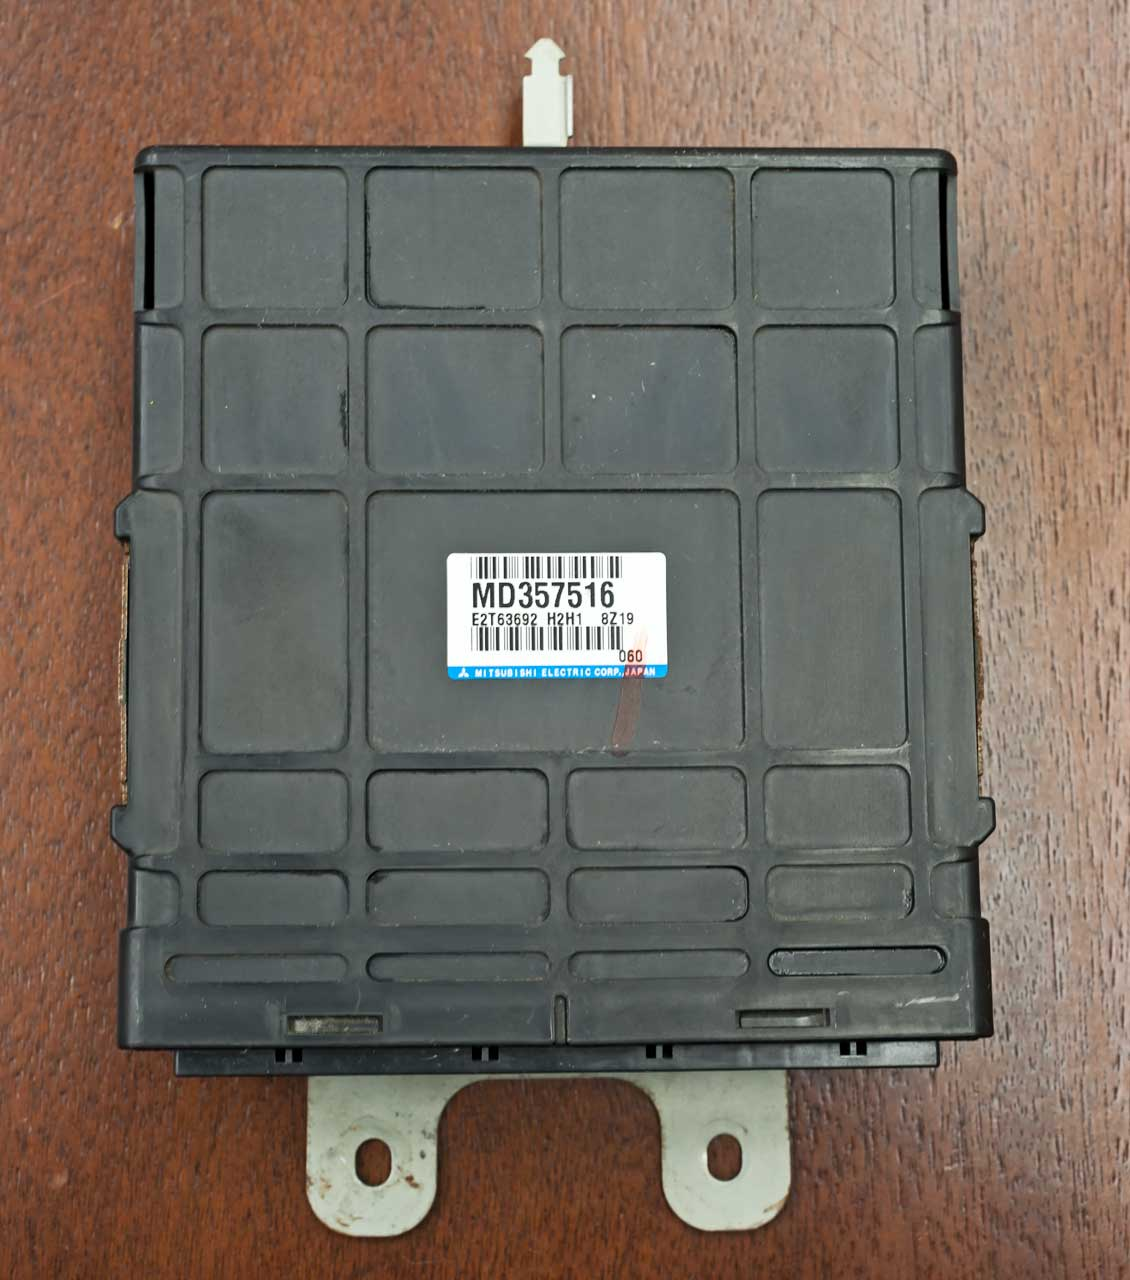 1995 mitsubishi eclipse gsx wiring diagram leg venous 95 mirage circuit maker